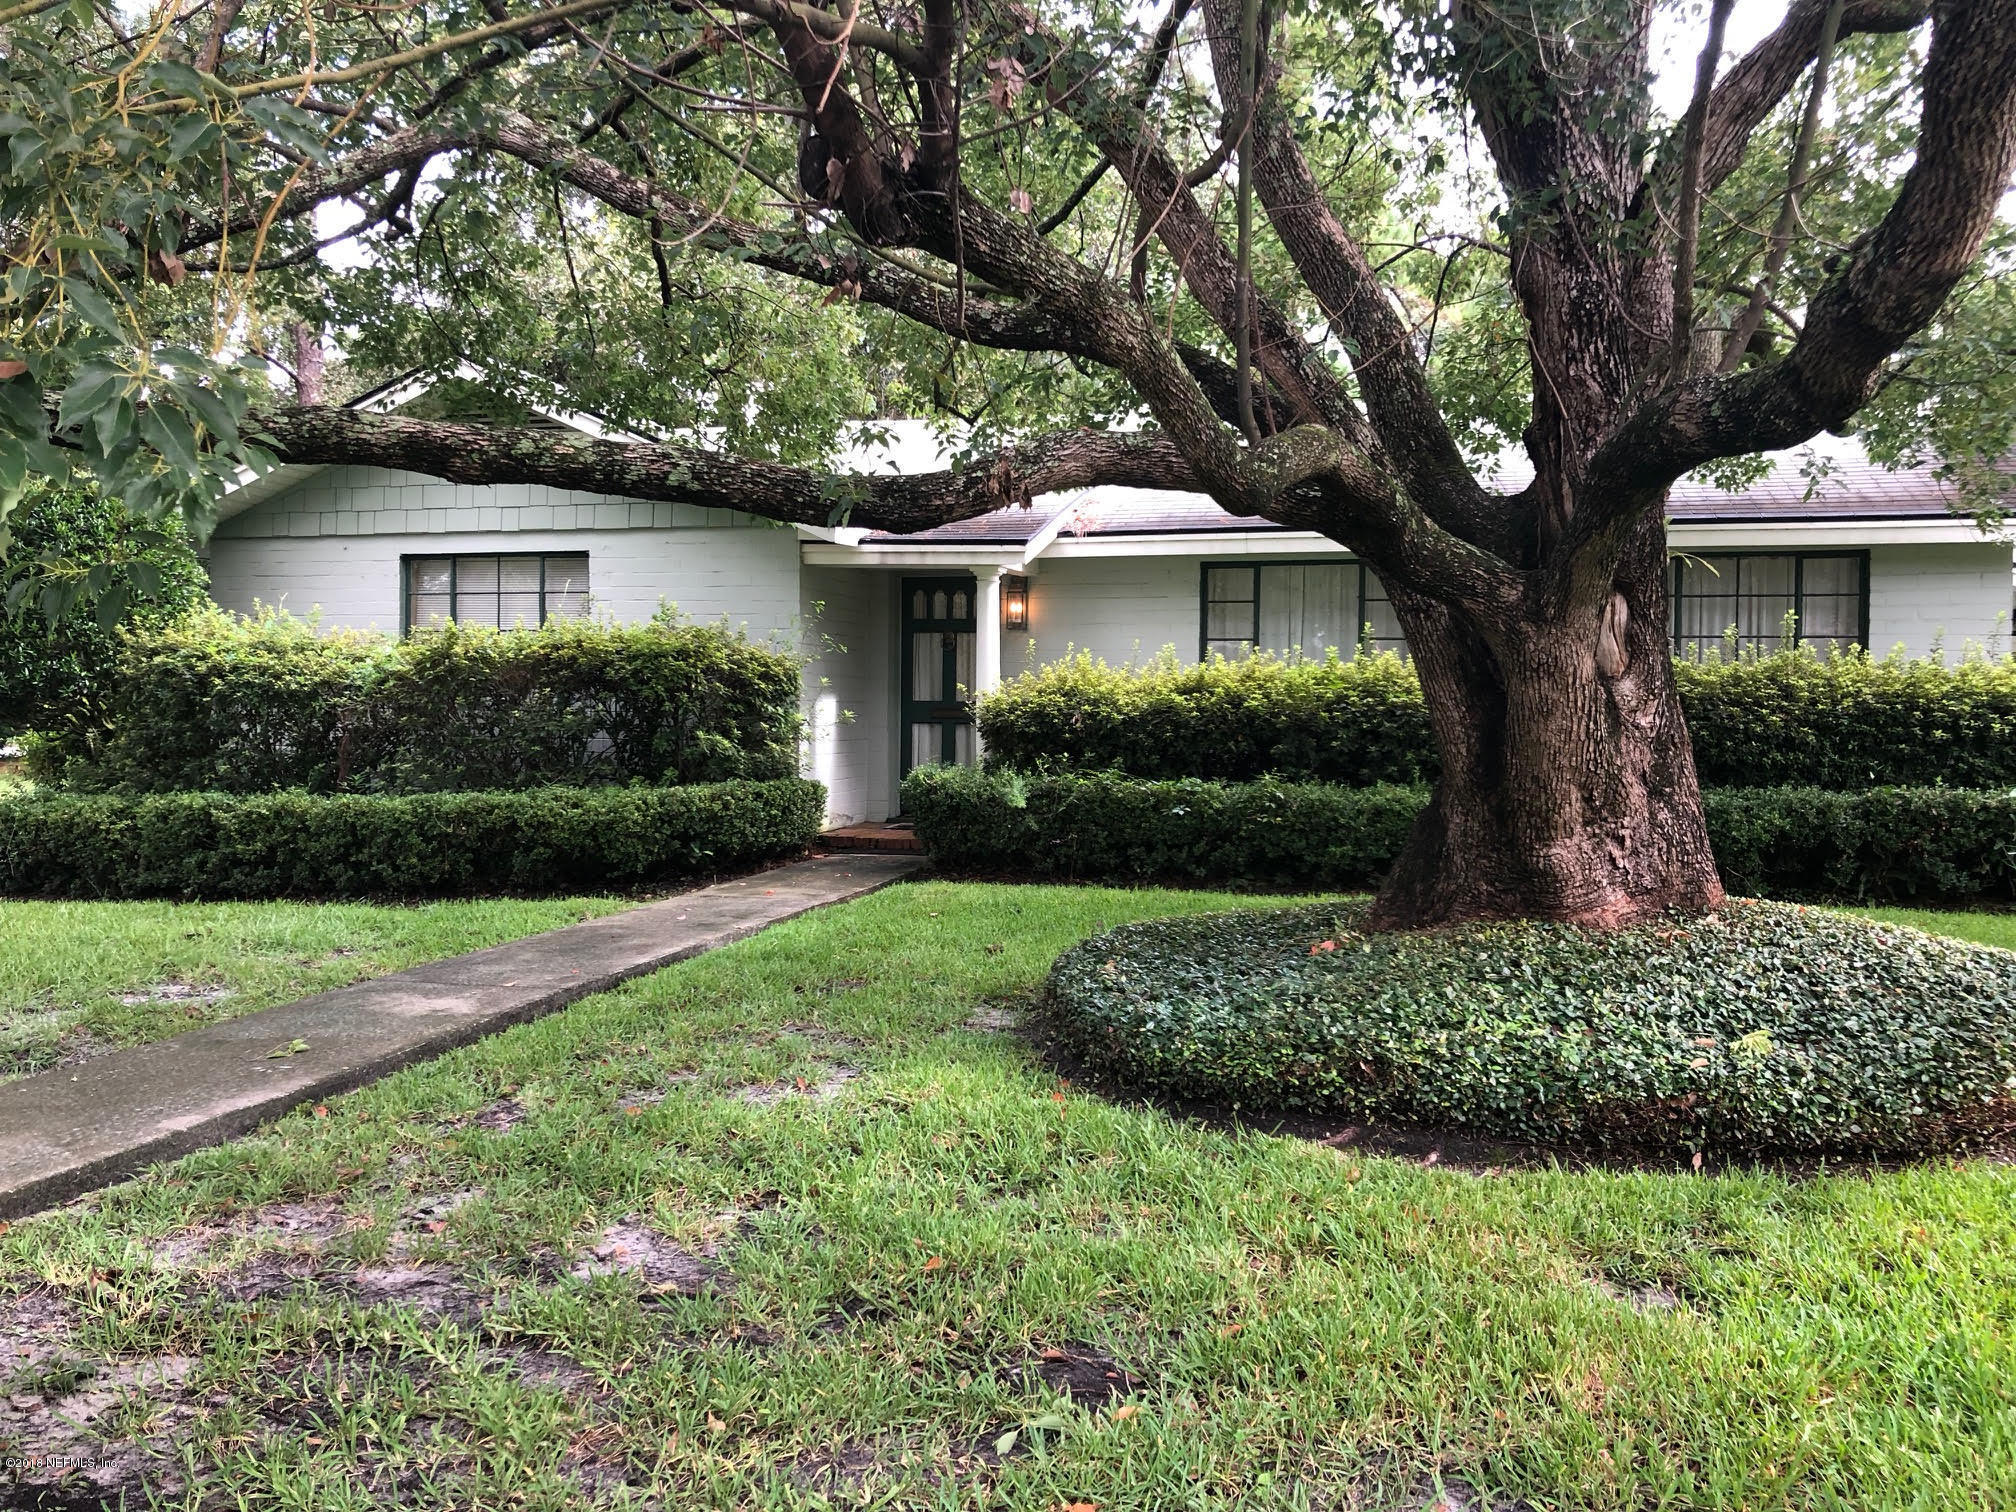 4371 DEMEDICI, JACKSONVILLE, FLORIDA 32210, 4 Bedrooms Bedrooms, ,3 BathroomsBathrooms,Residential - single family,For sale,DEMEDICI,948232